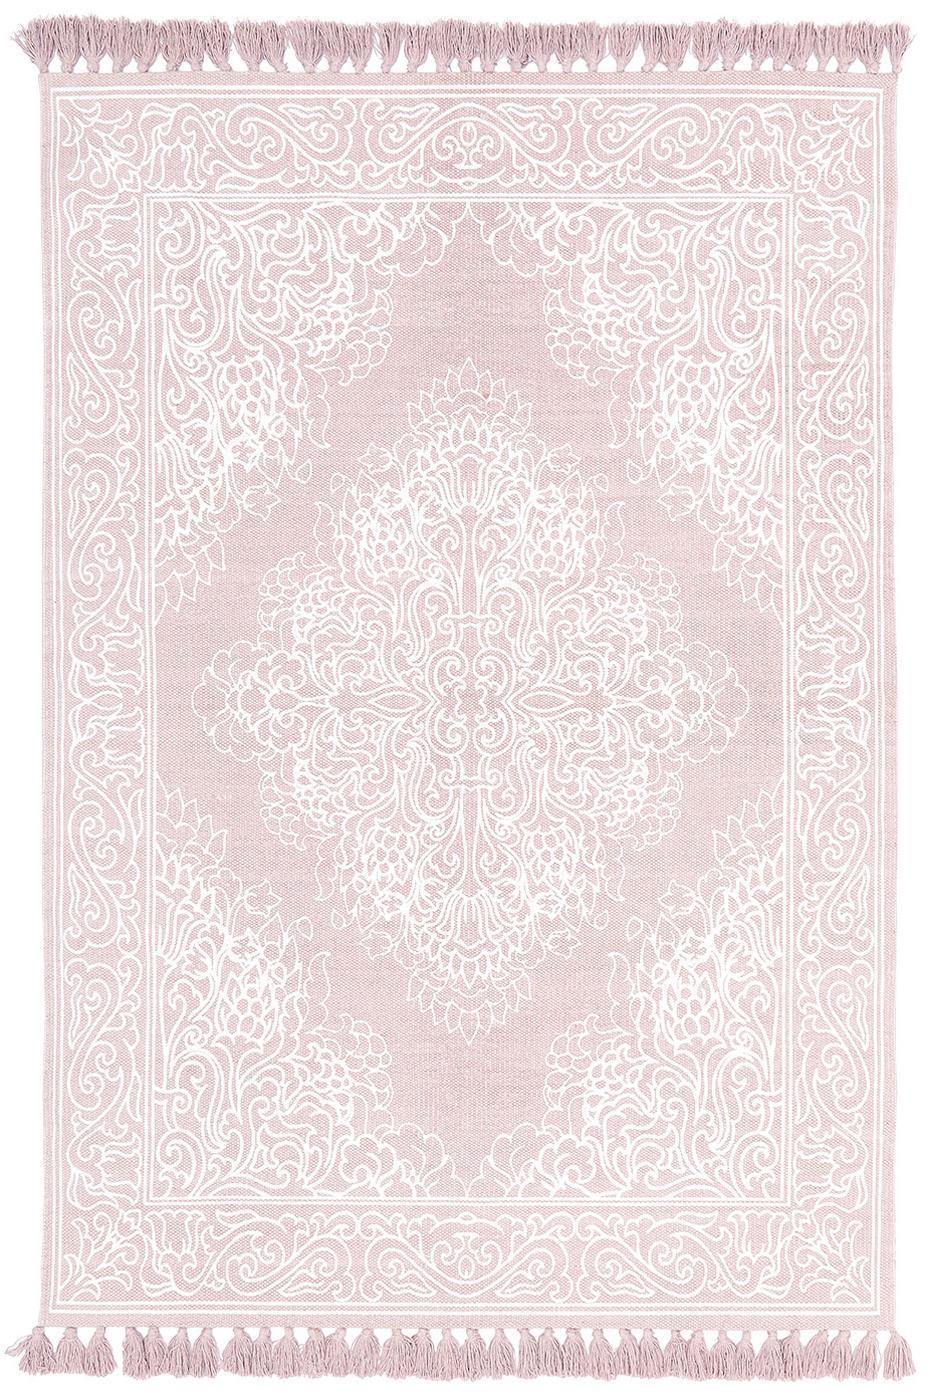 Alfombra artesanal de algodón con borlas Salima, 100%algodón, Rosa, blanco crema, An 50 x L 80 cm (Tamaño XXS)